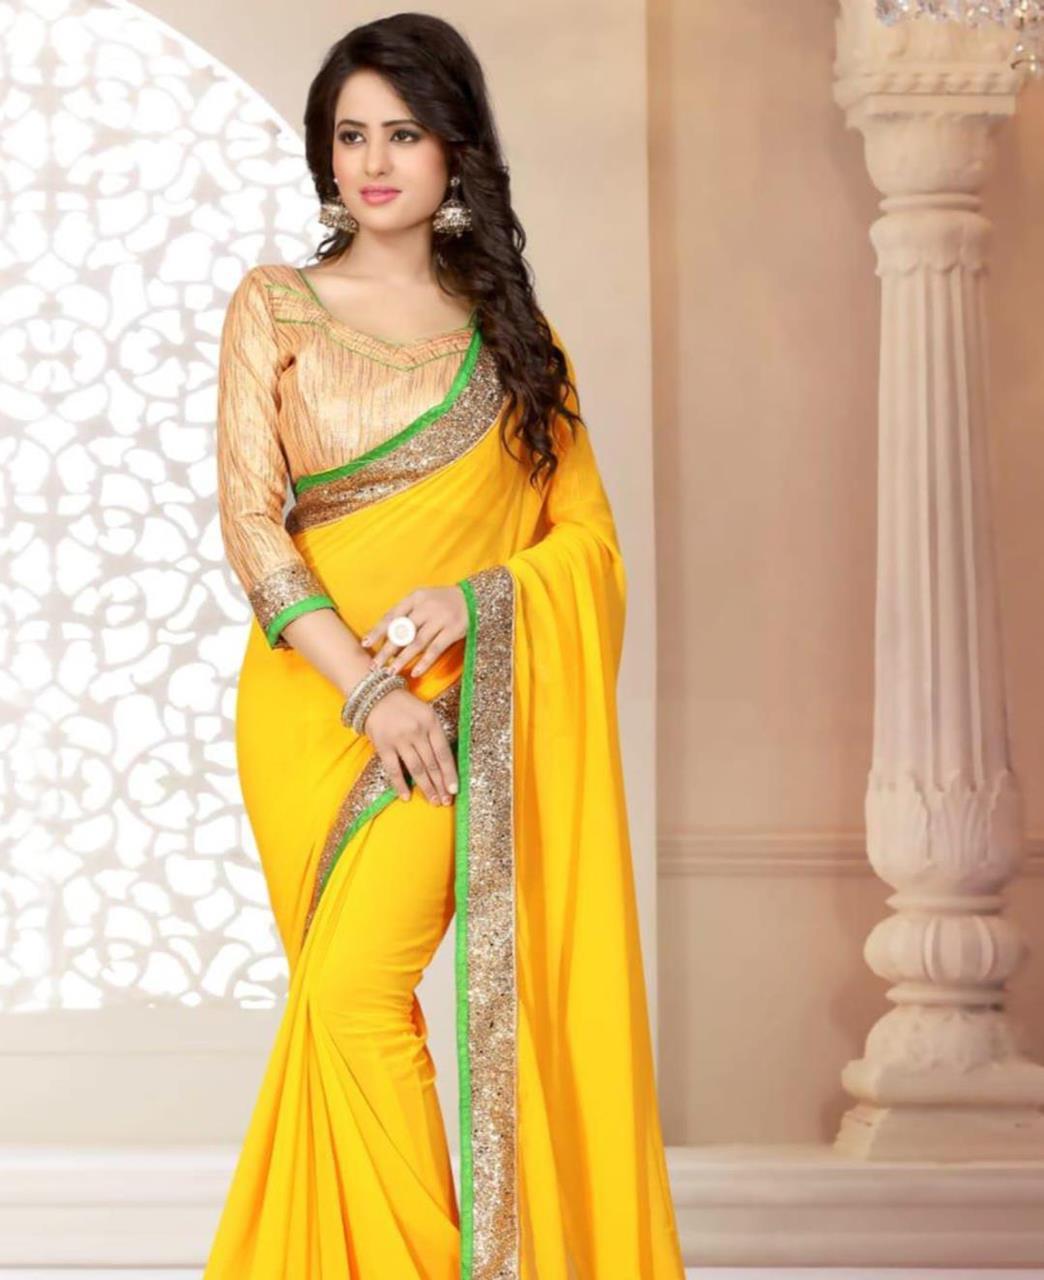 Lace Georgette Saree (Sari) in Yellow